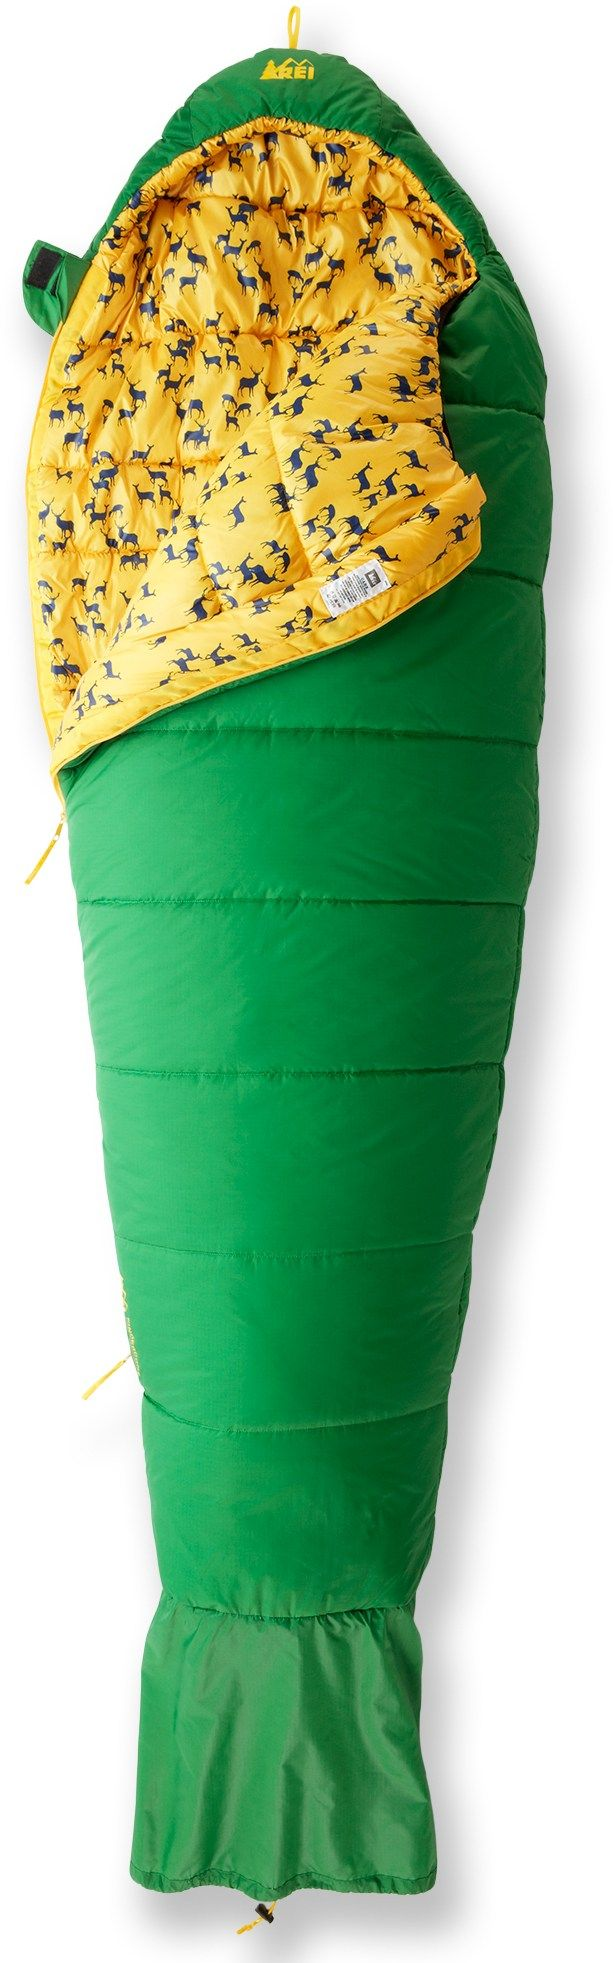 22 best 130 sleeping bags mats images on pinterest sleeping